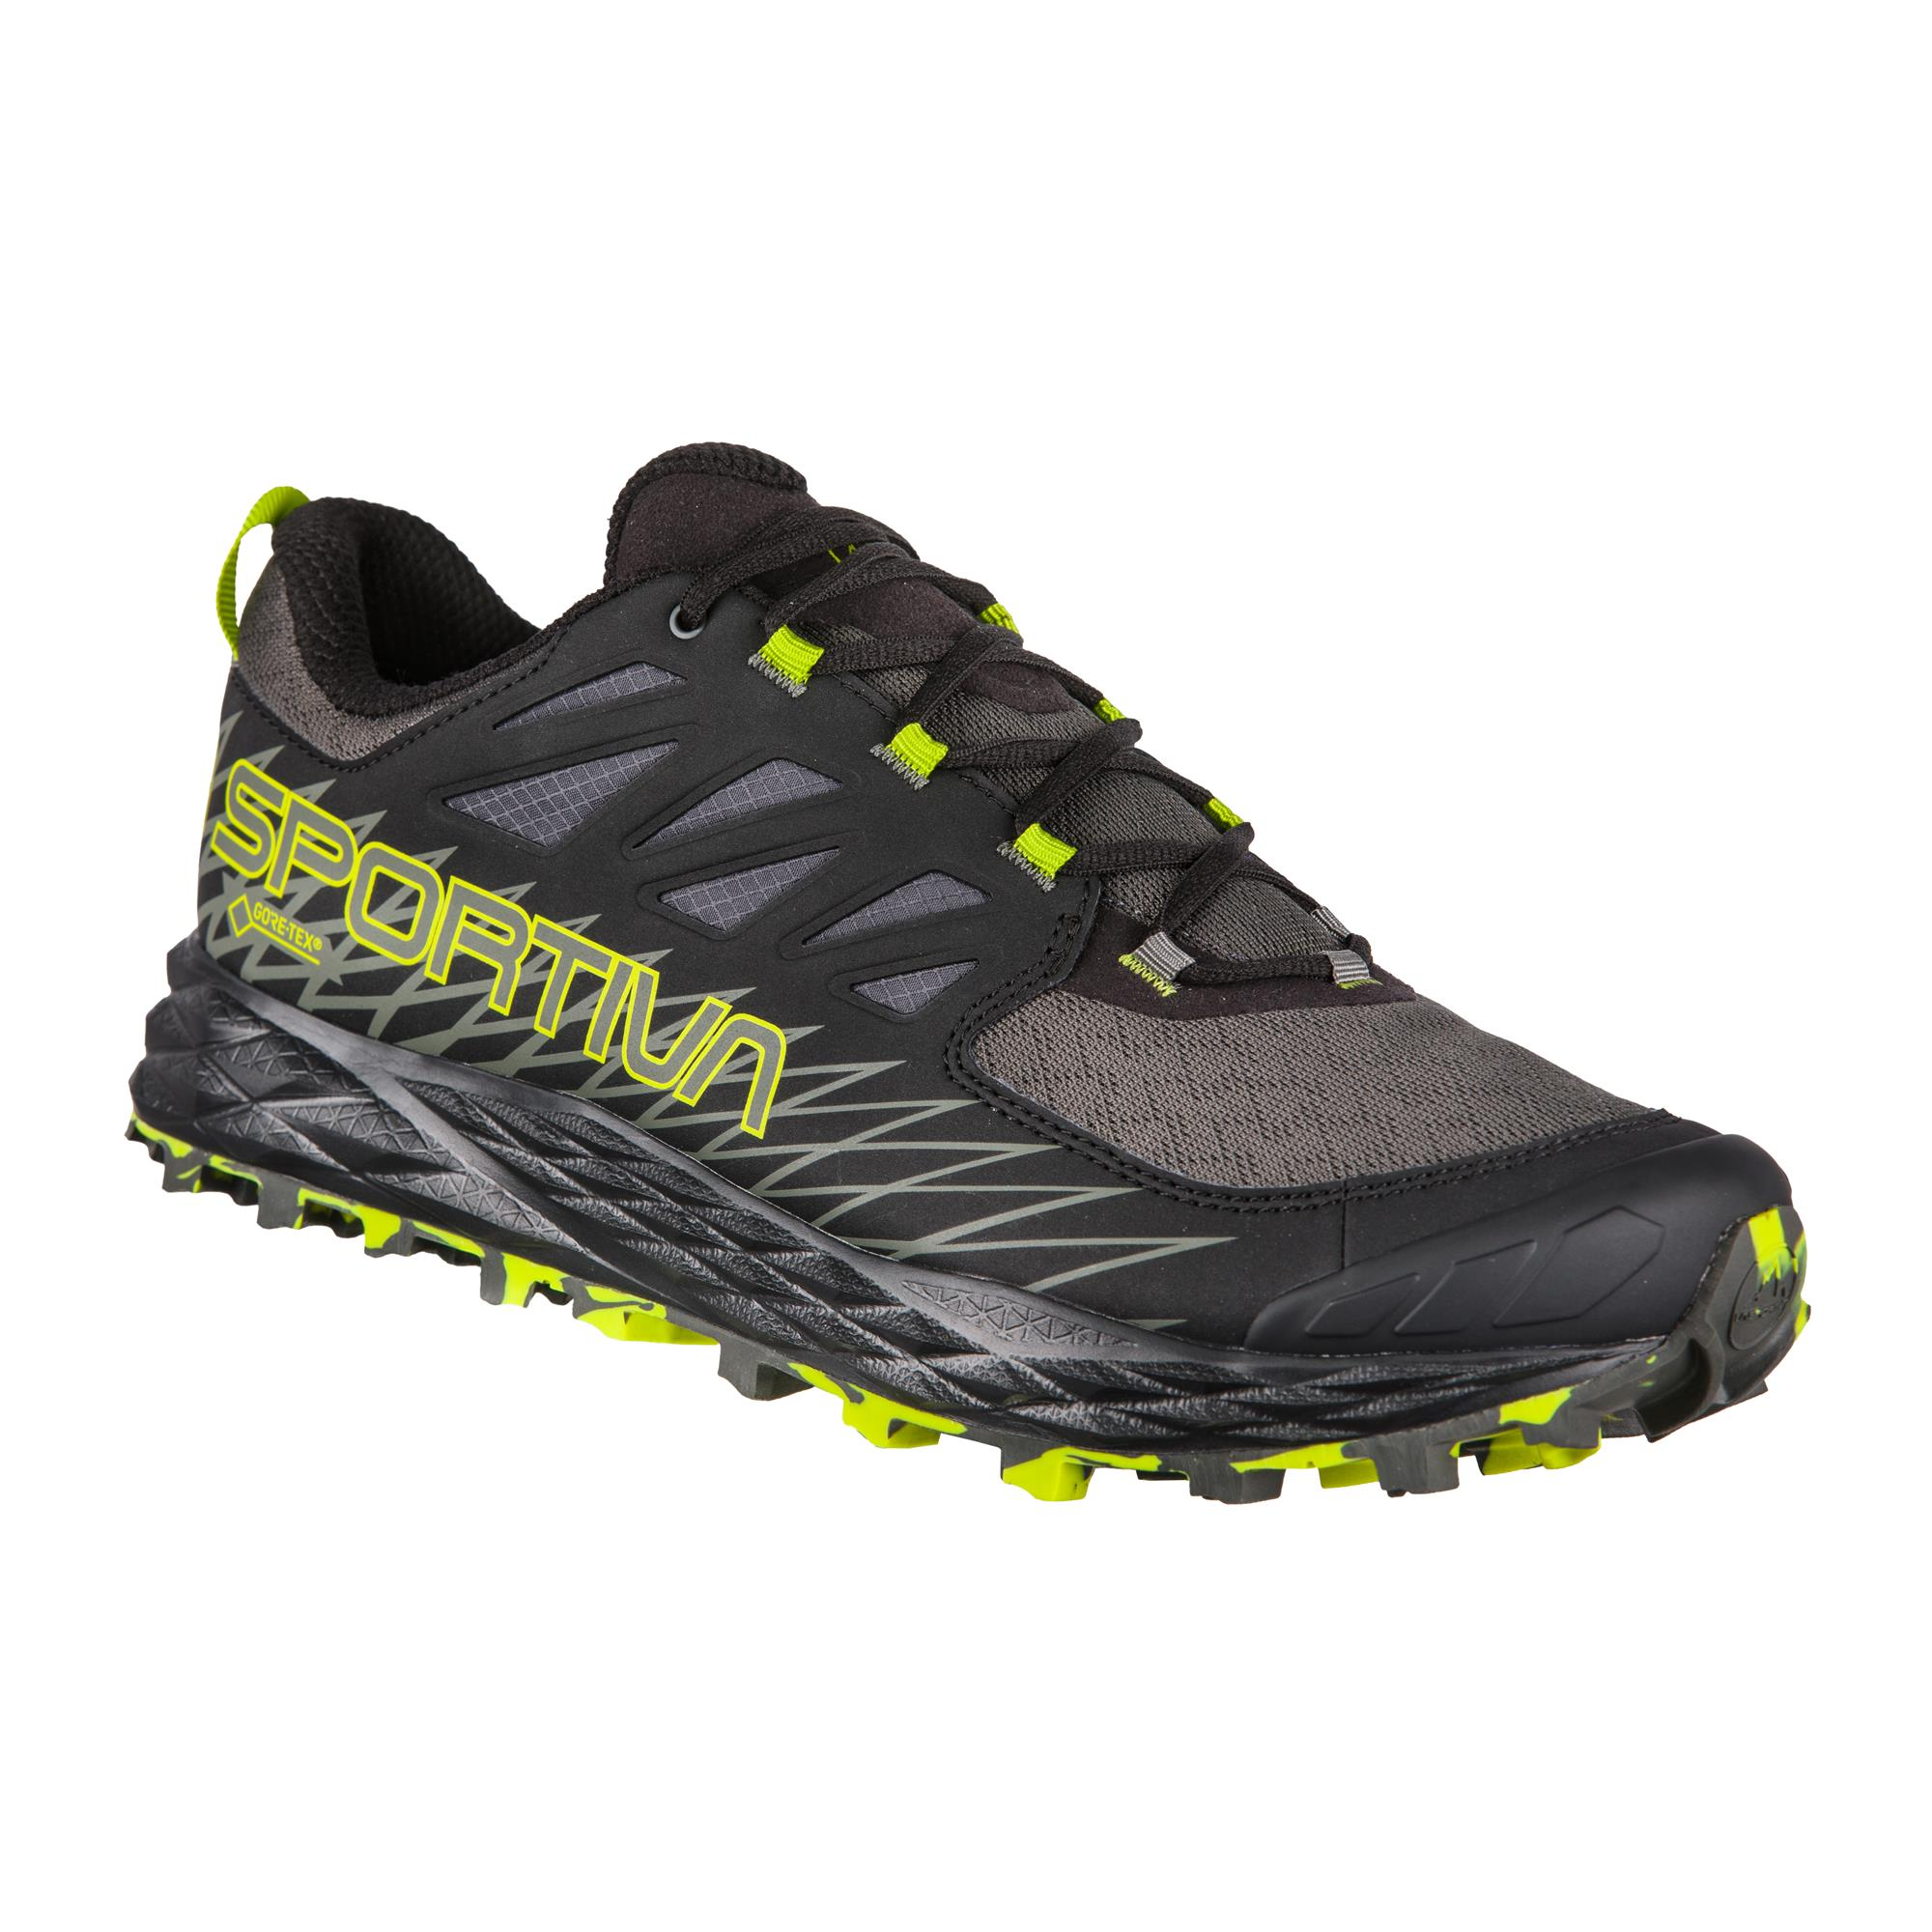 La Sportiva Lycan GTX Herren Trailrunning-Schuhe dunkelgrau,carbon/apple green